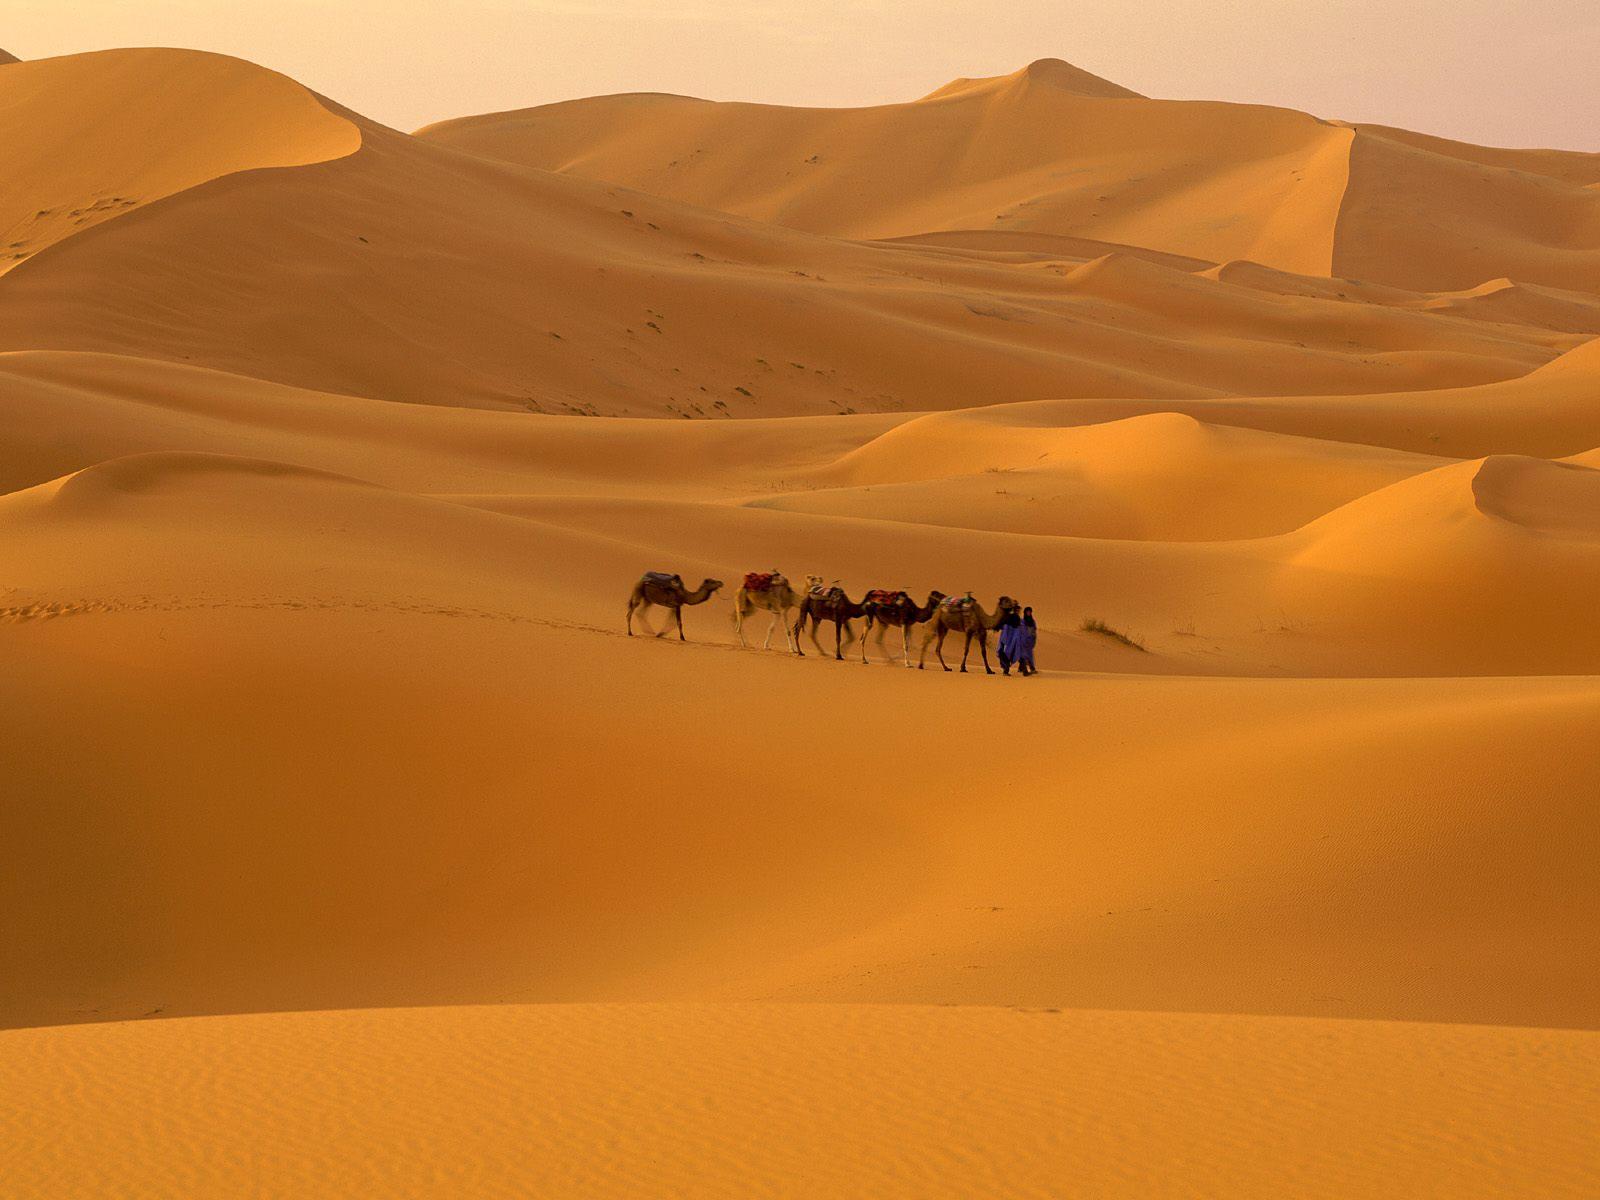 http://2.bp.blogspot.com/-W8gCUmhxD78/TsGuHxIu-uI/AAAAAAAACyU/O48wWDNE868/s1600/Sahara+Desert%252C+Morocco+pictures.jpg